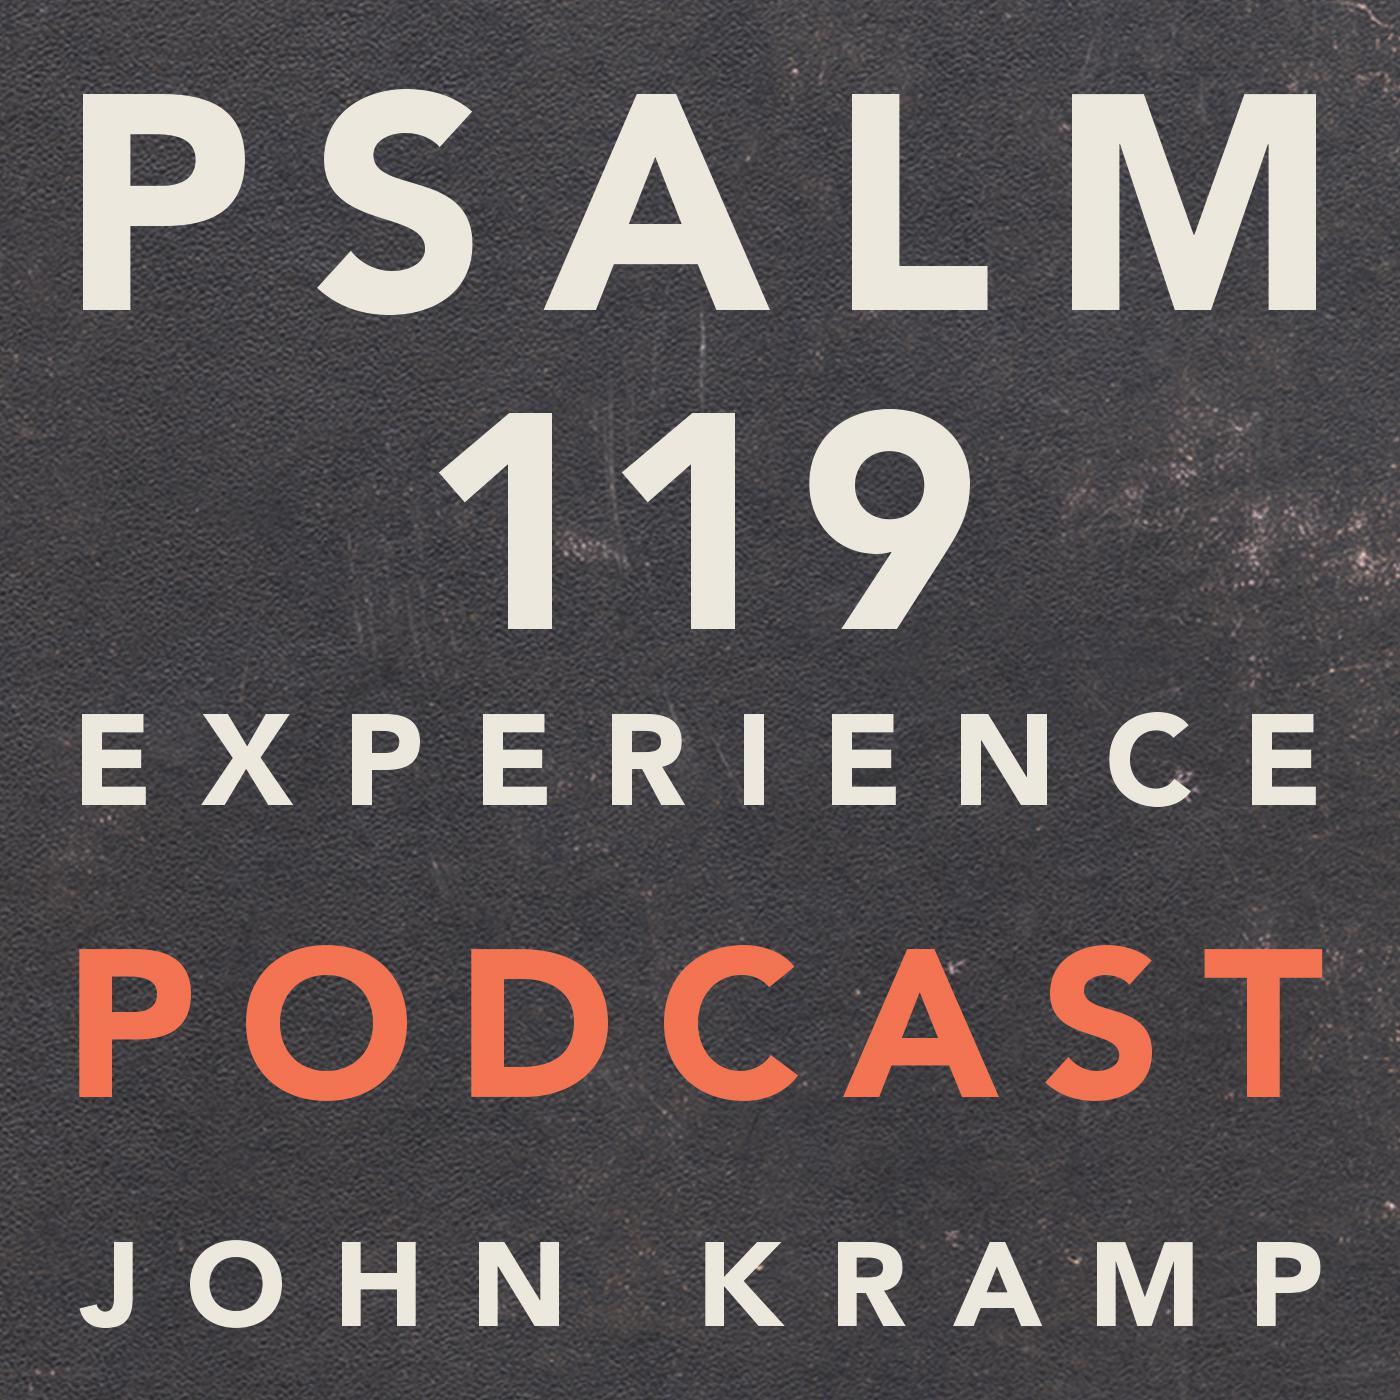 The Psalm 119 Experience (podcast) - John Kramp | Listen Notes